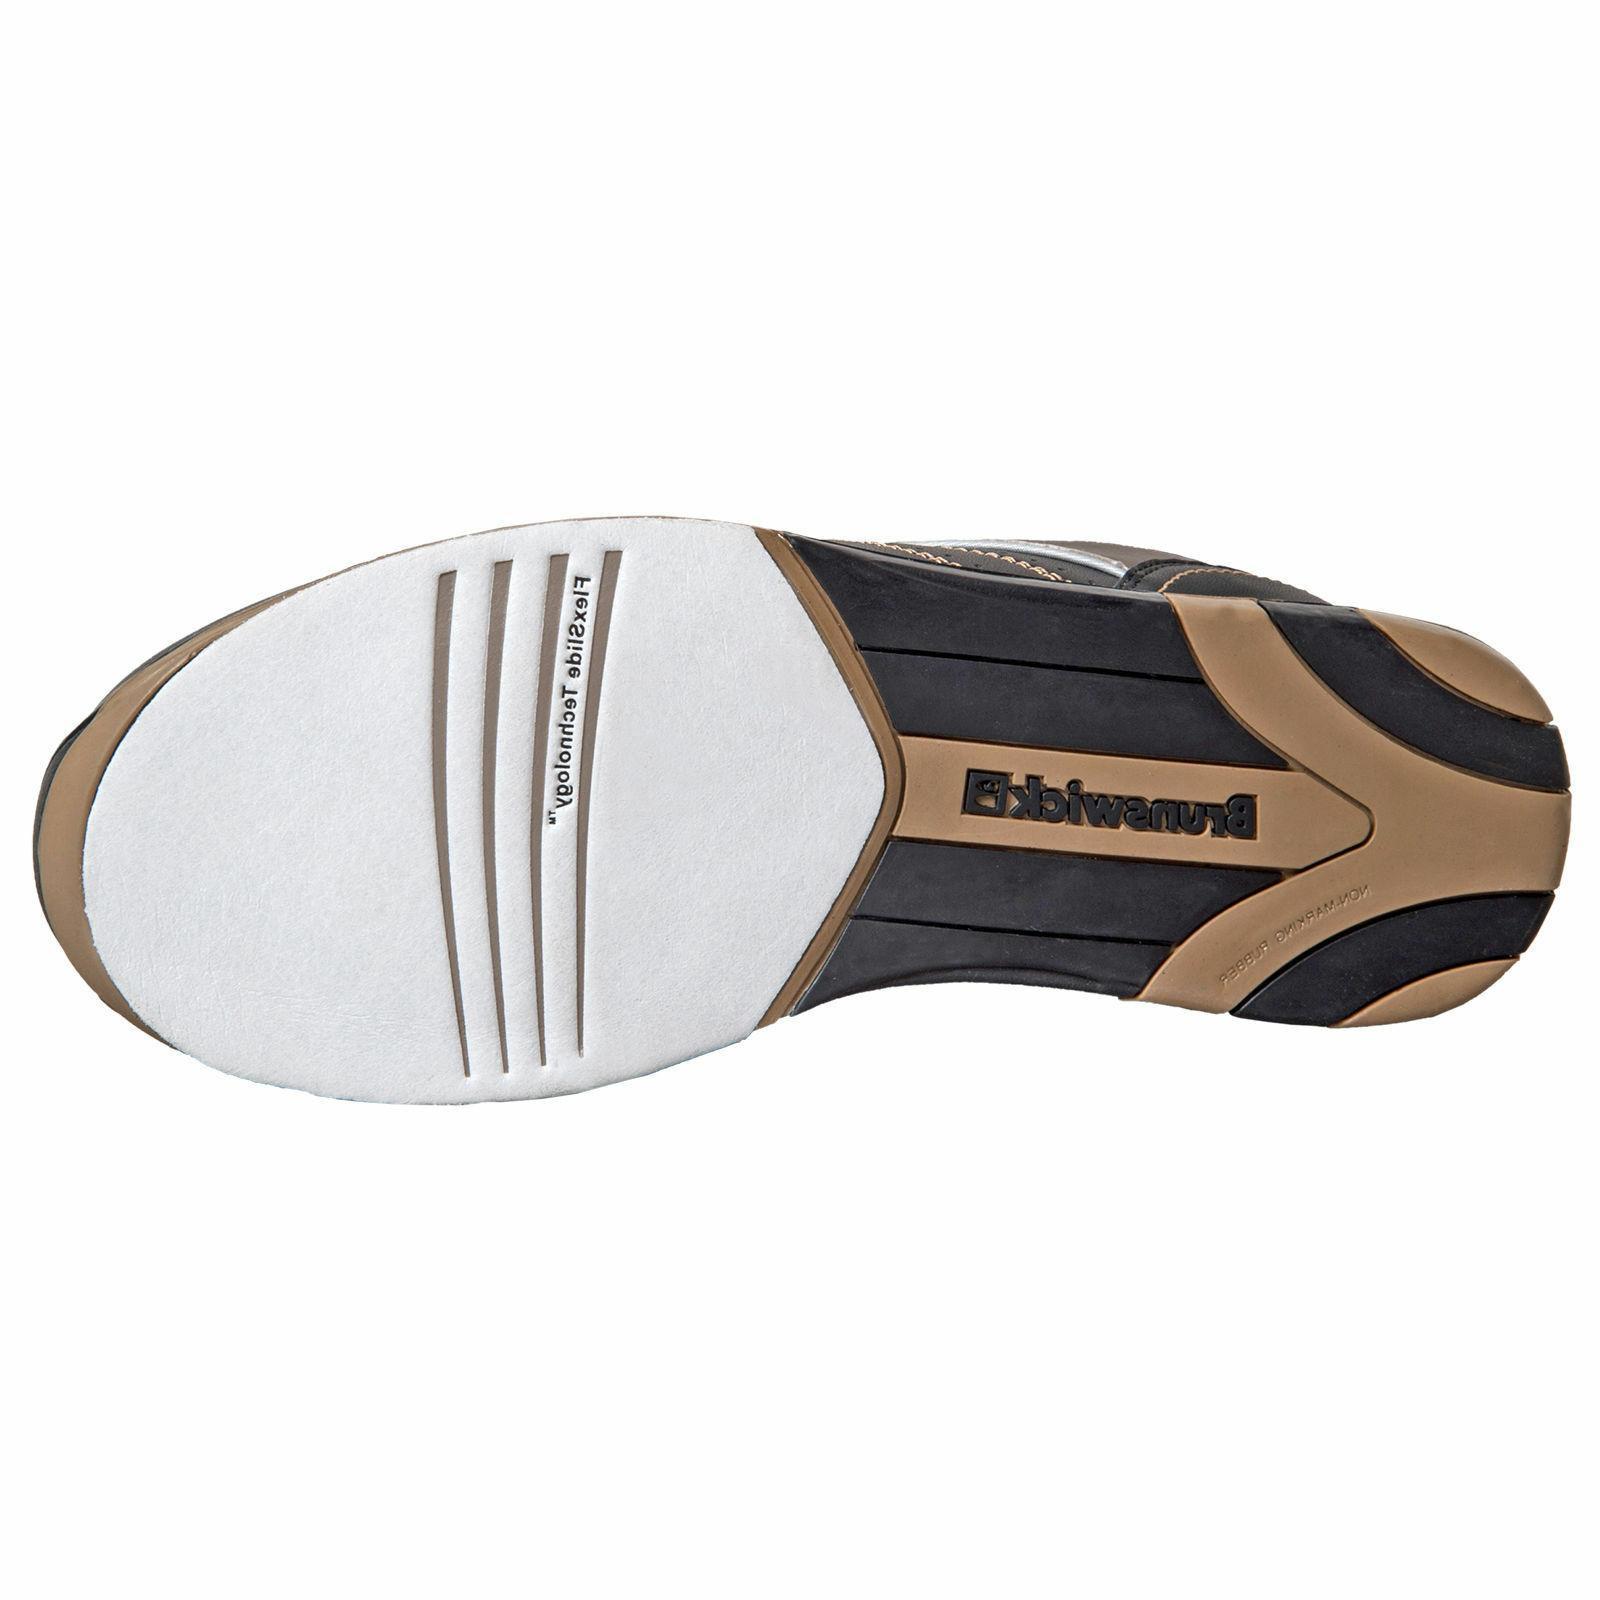 Mens Black/Gold Bowling Shoes 7, 7